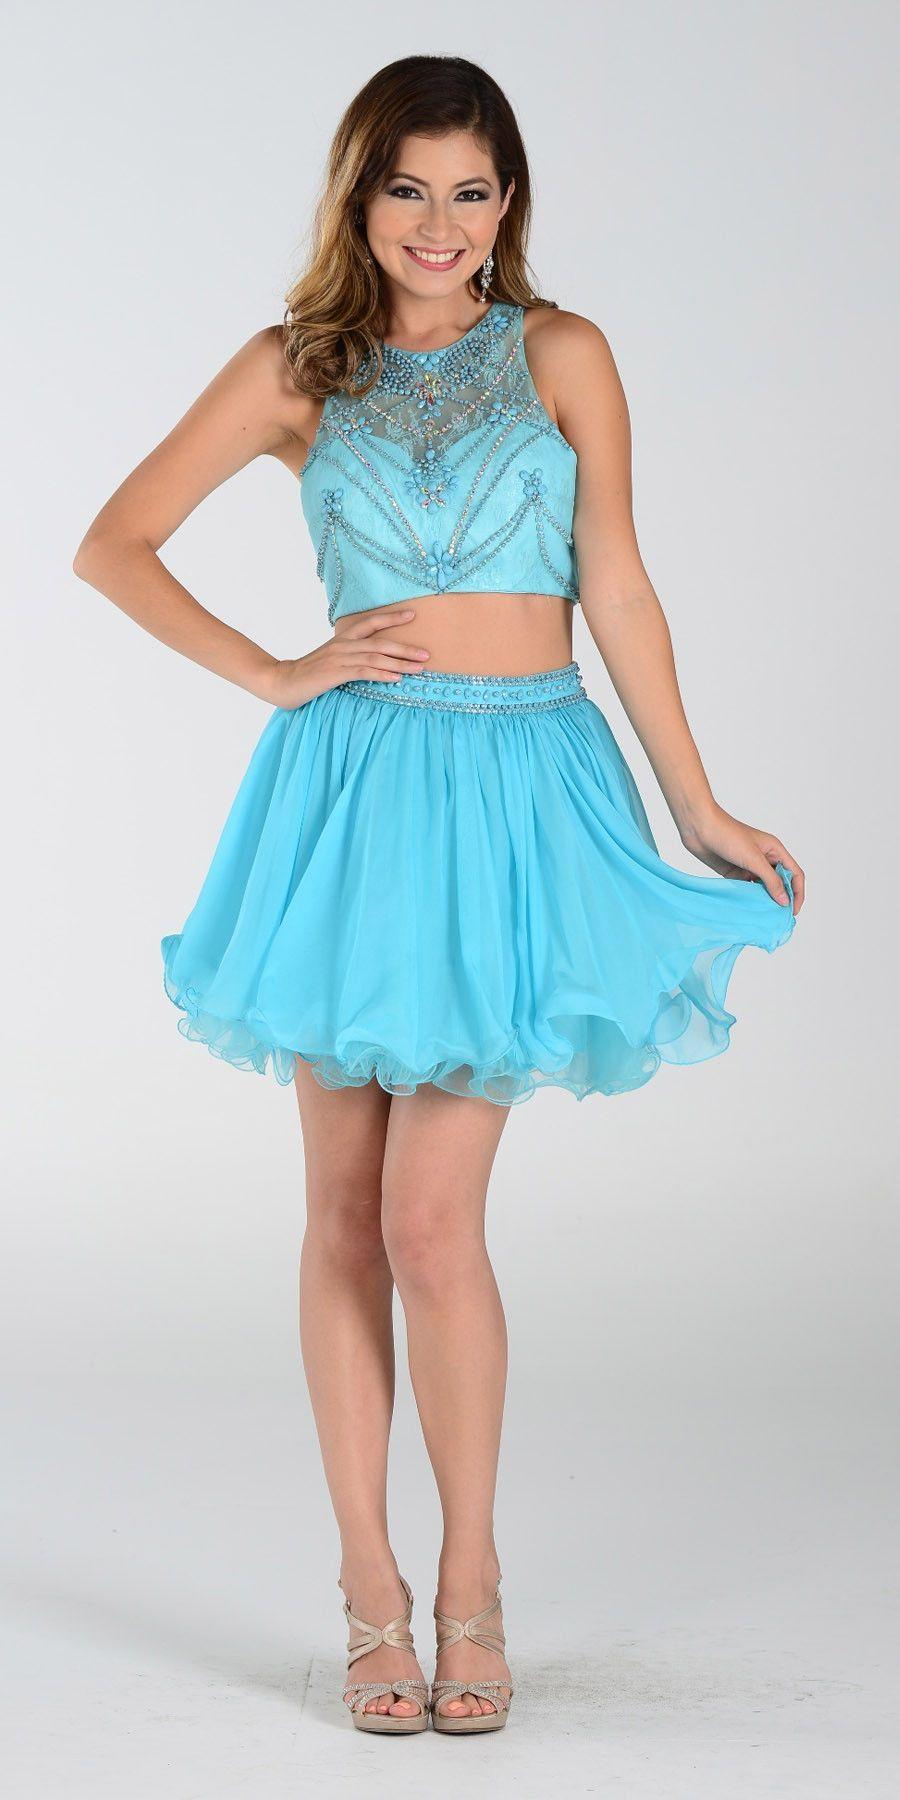 Poly usa short piece prom dress aqua chiffon skirt prom